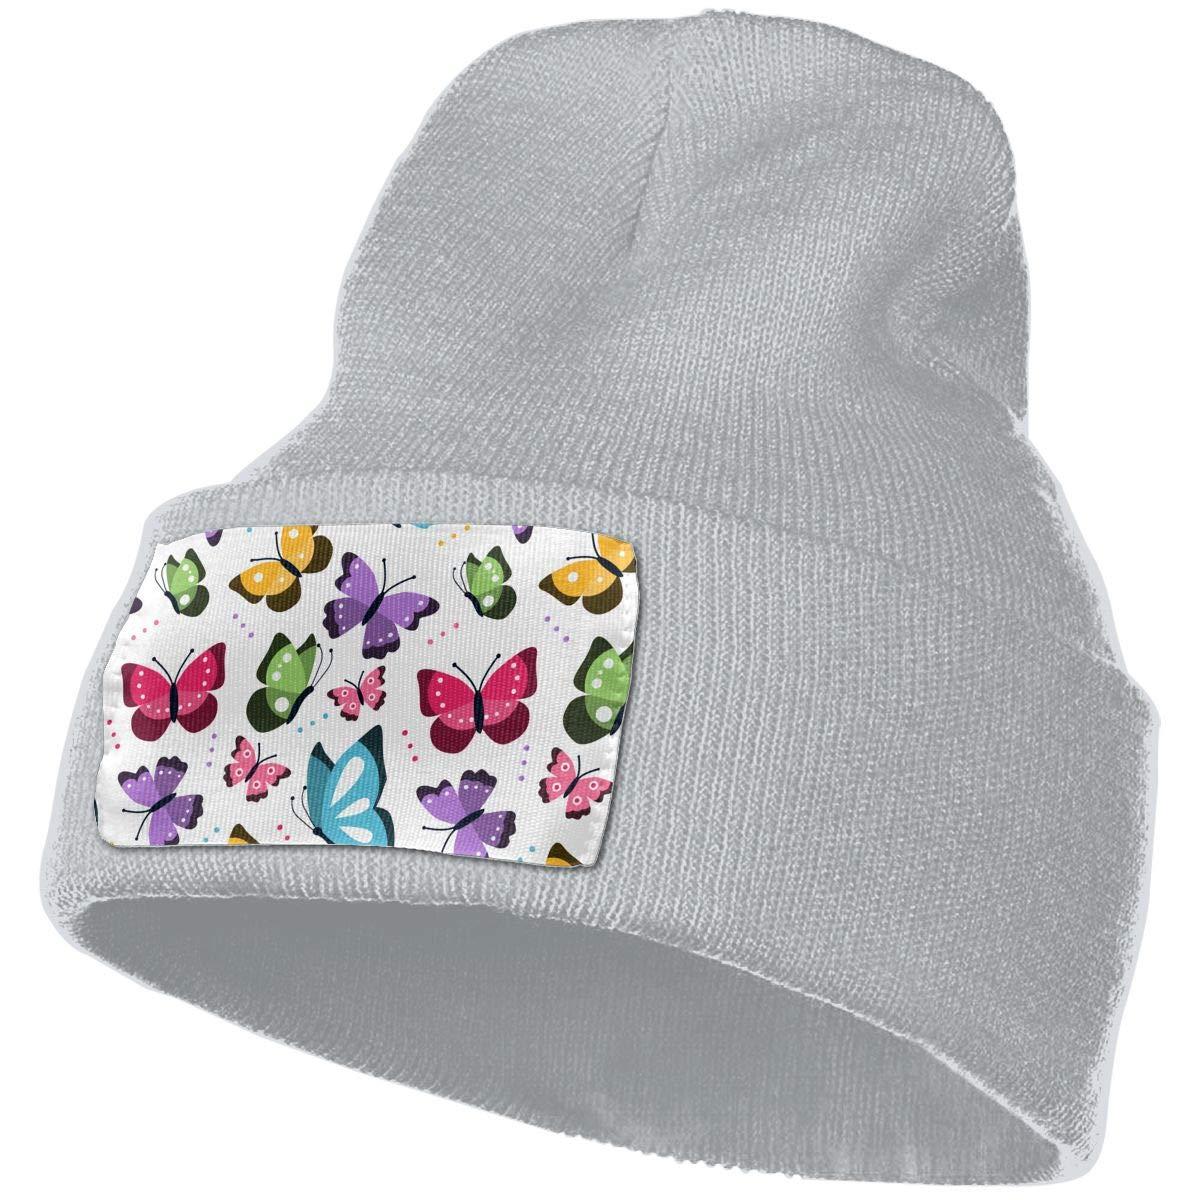 TAOMAP89 Men /& Women Skull Caps Winter Warm Stretchy Knit Beanie Hats